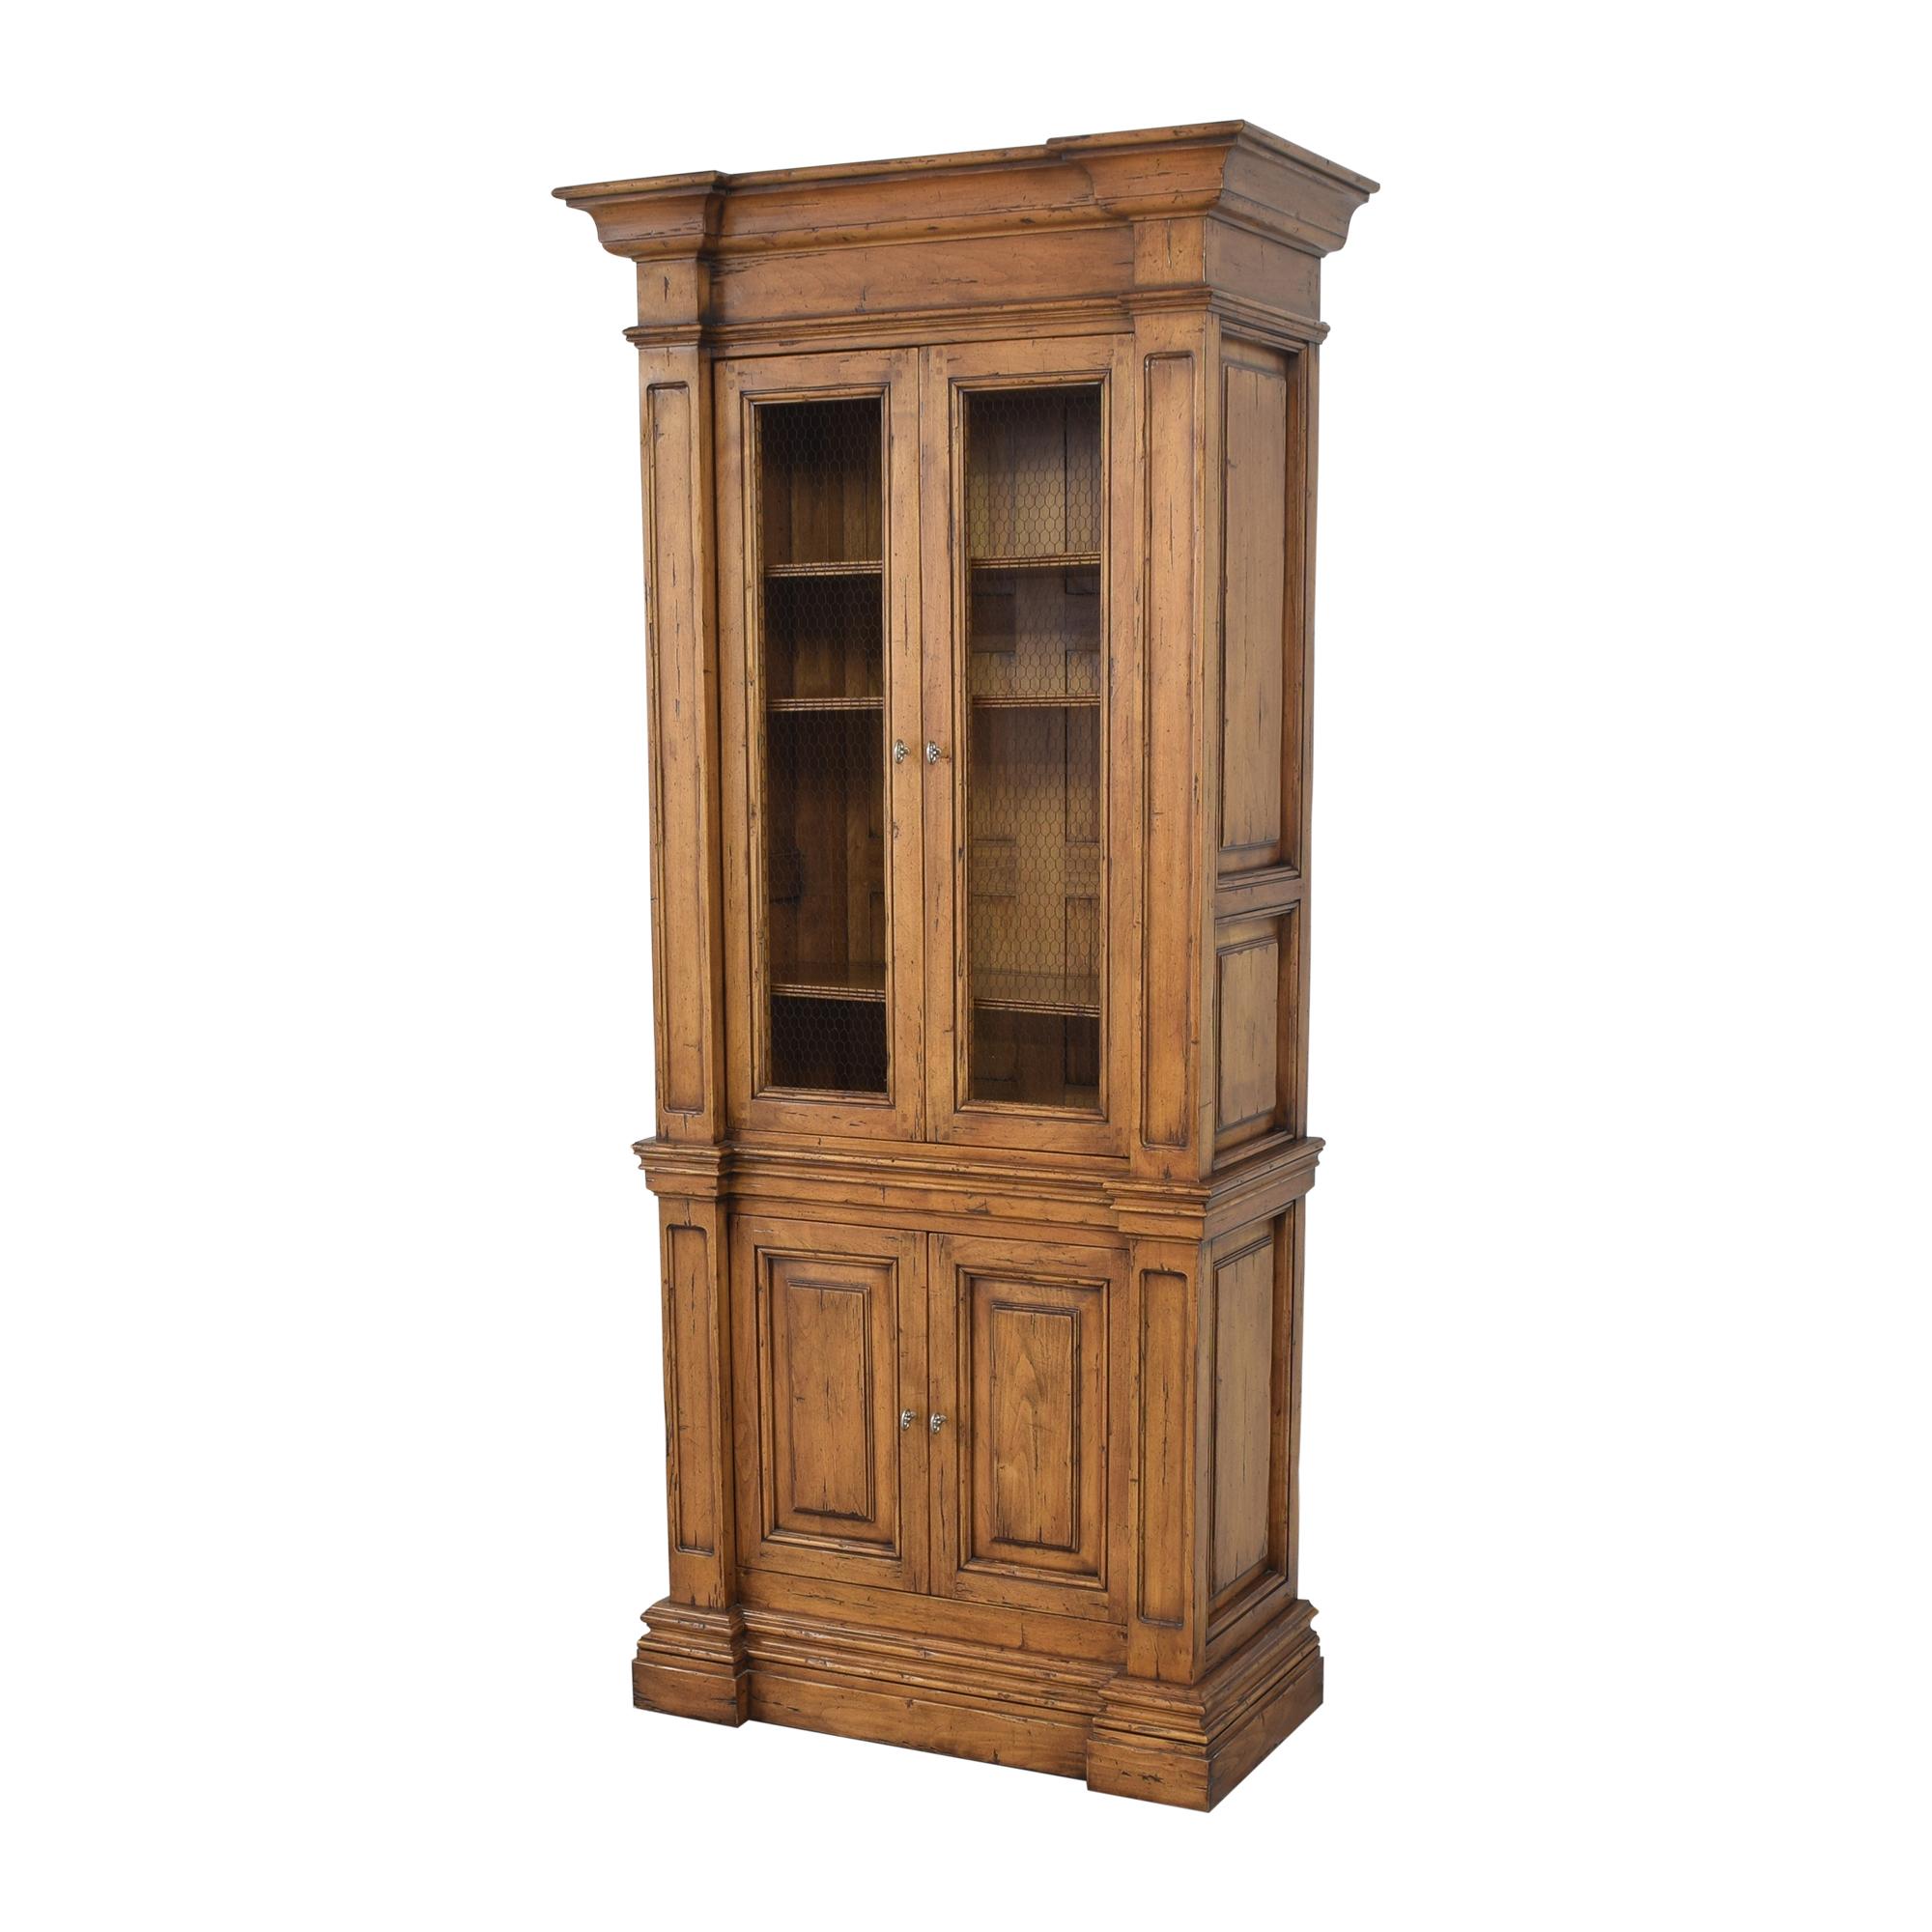 Guy Chaddock & Co. Hutch Cabinet / Storage